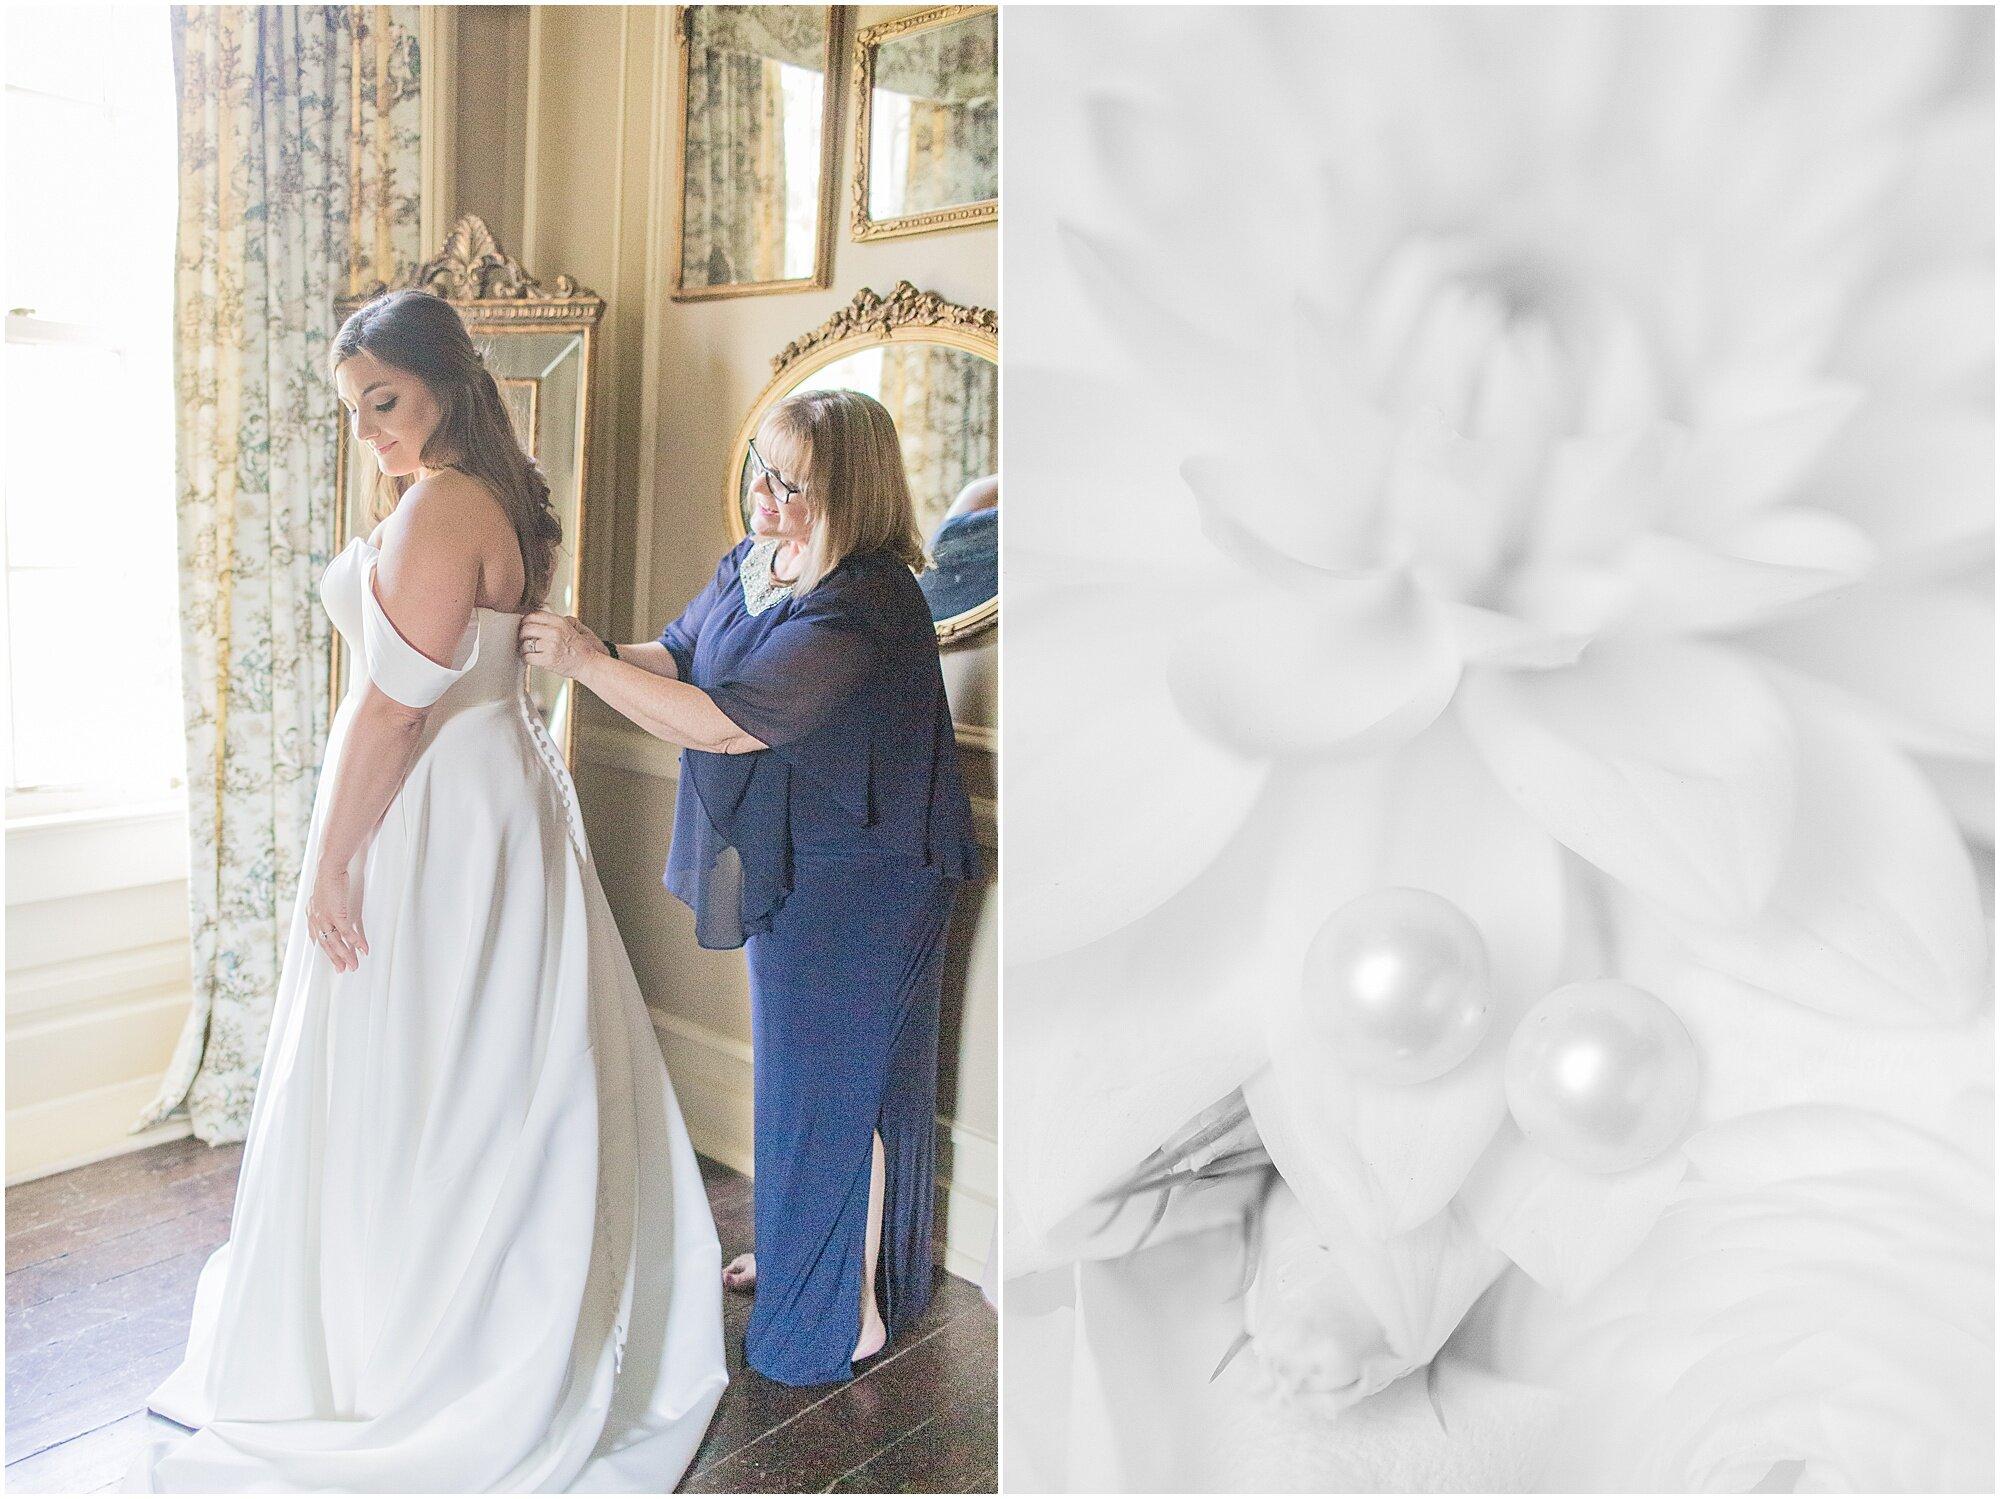 cedar-hall-wedding-memphis-tennessee_0006.jpg